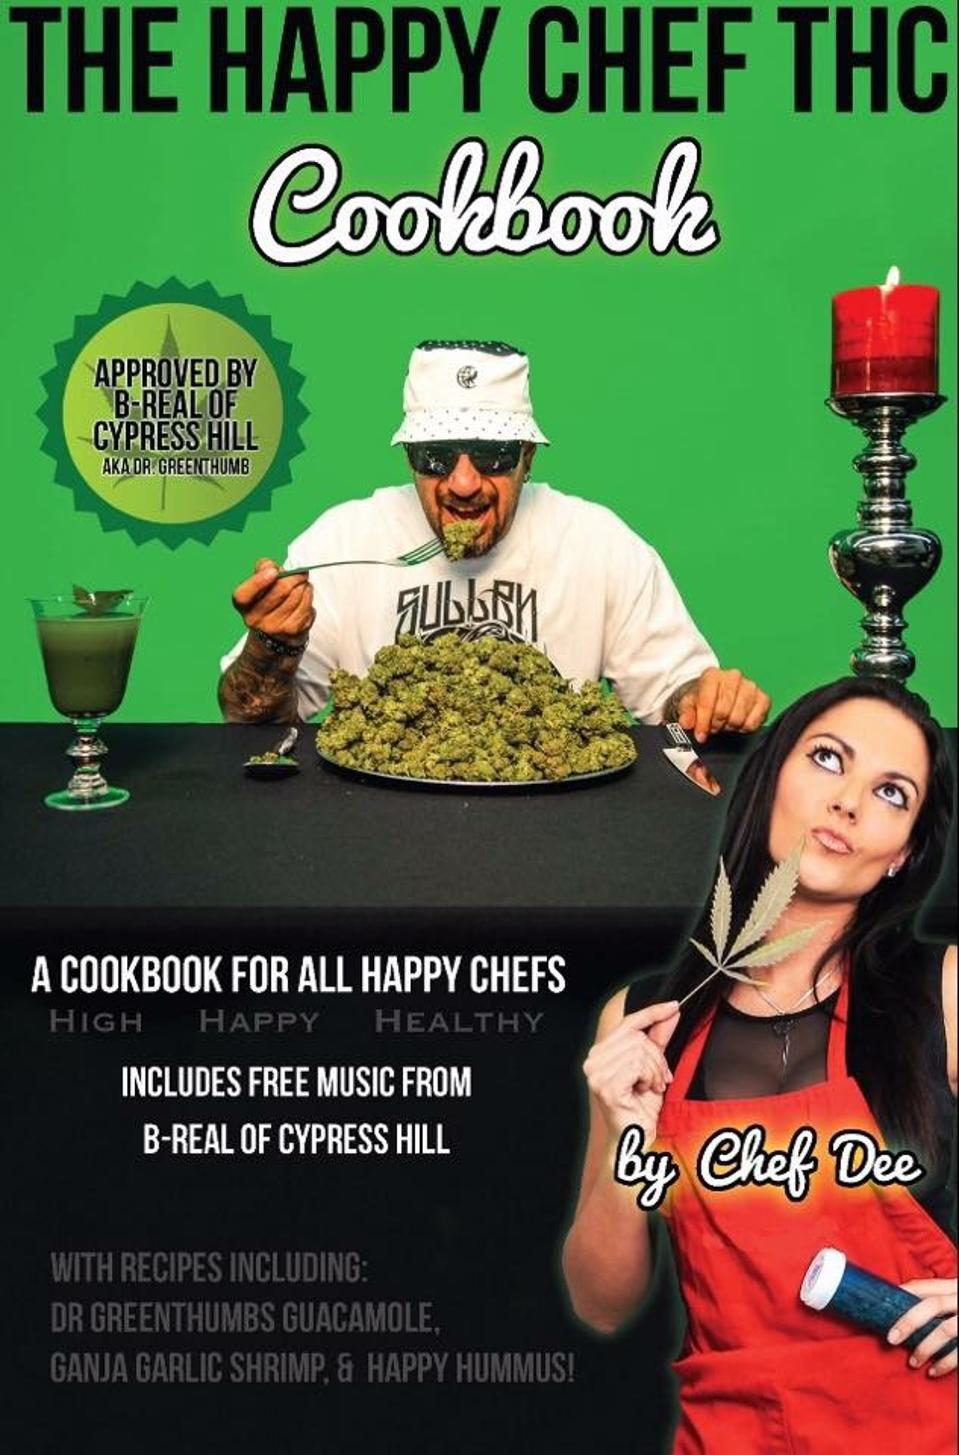 The Happy Chef THC Cookbook